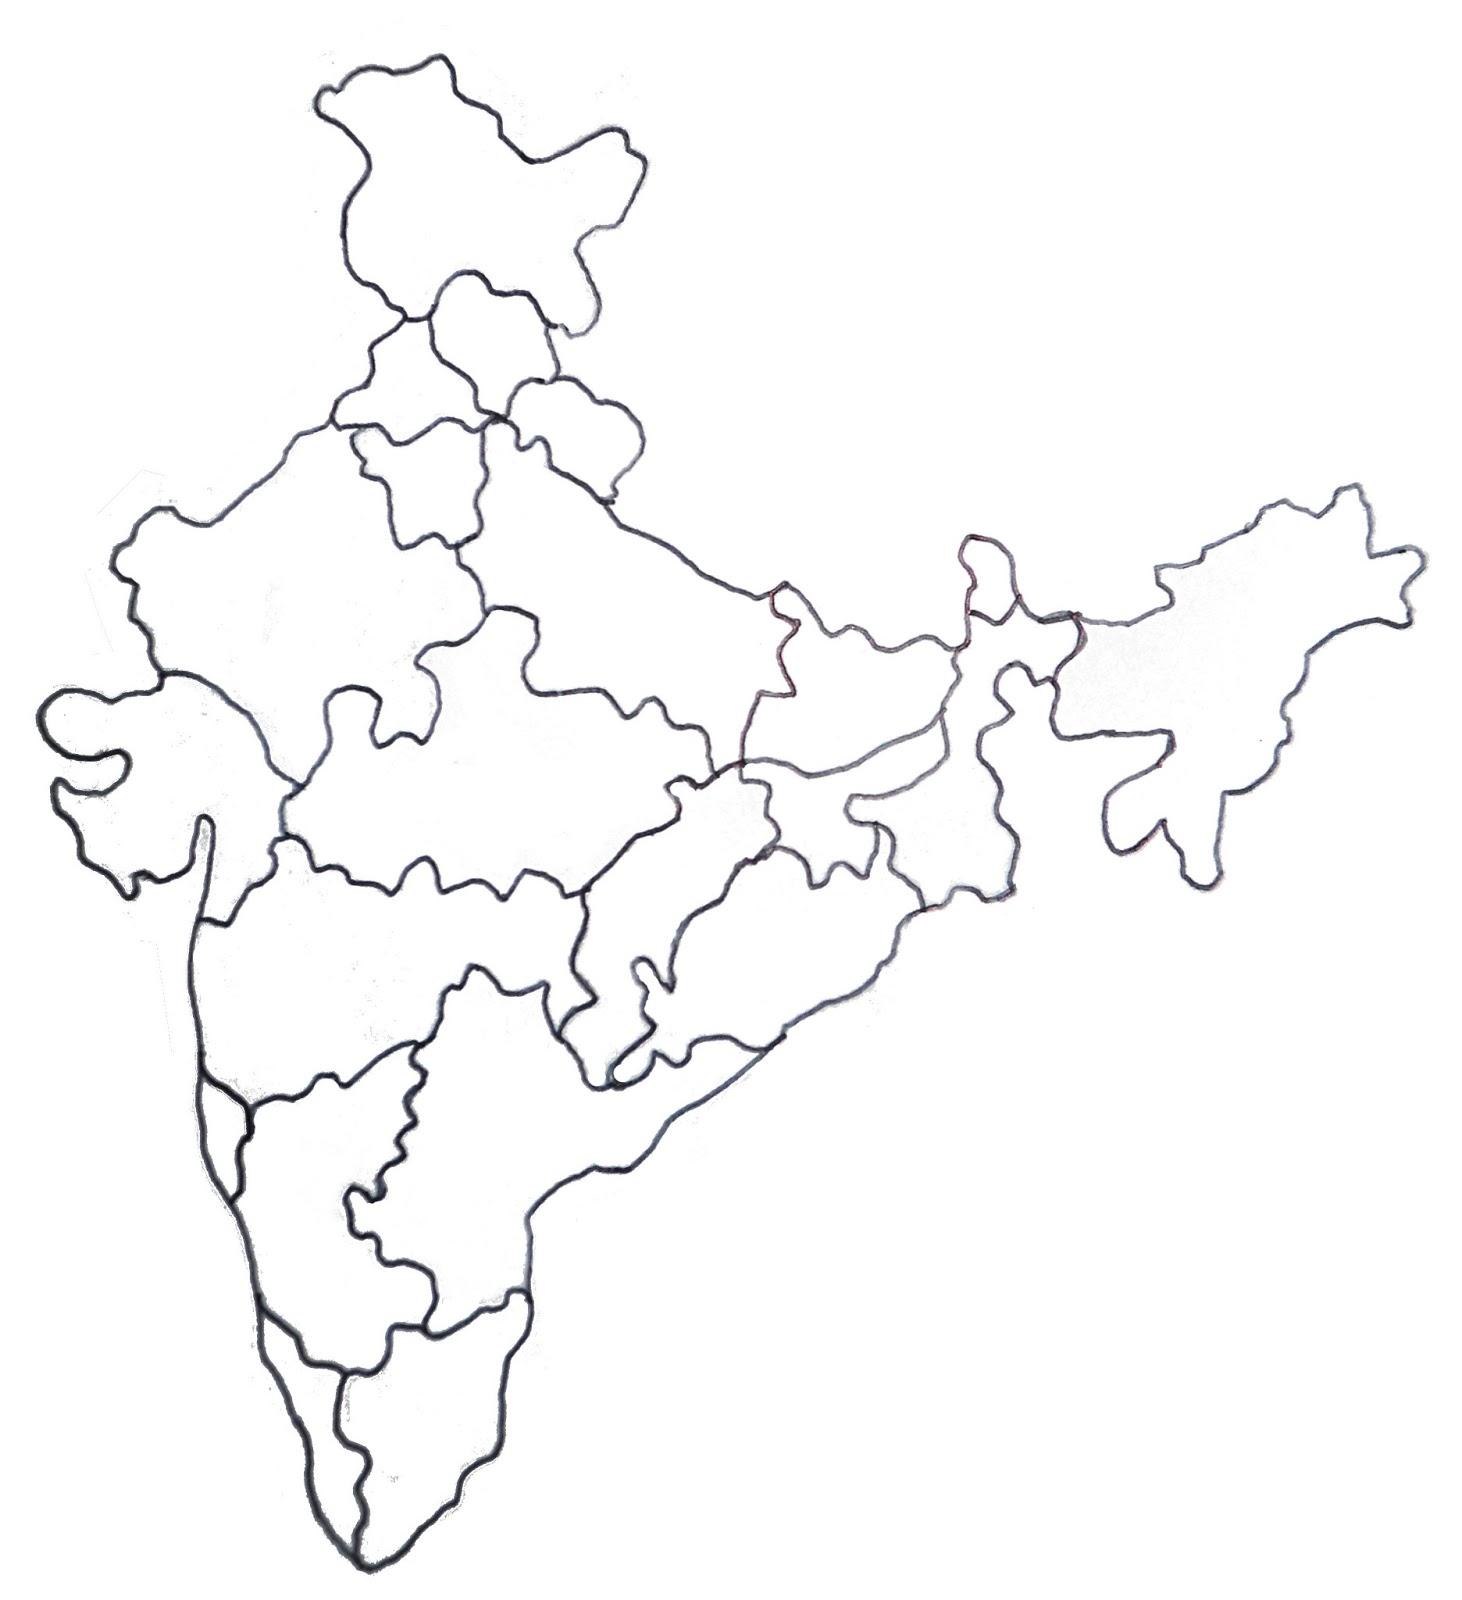 India Map Drawing | compressportnederland on